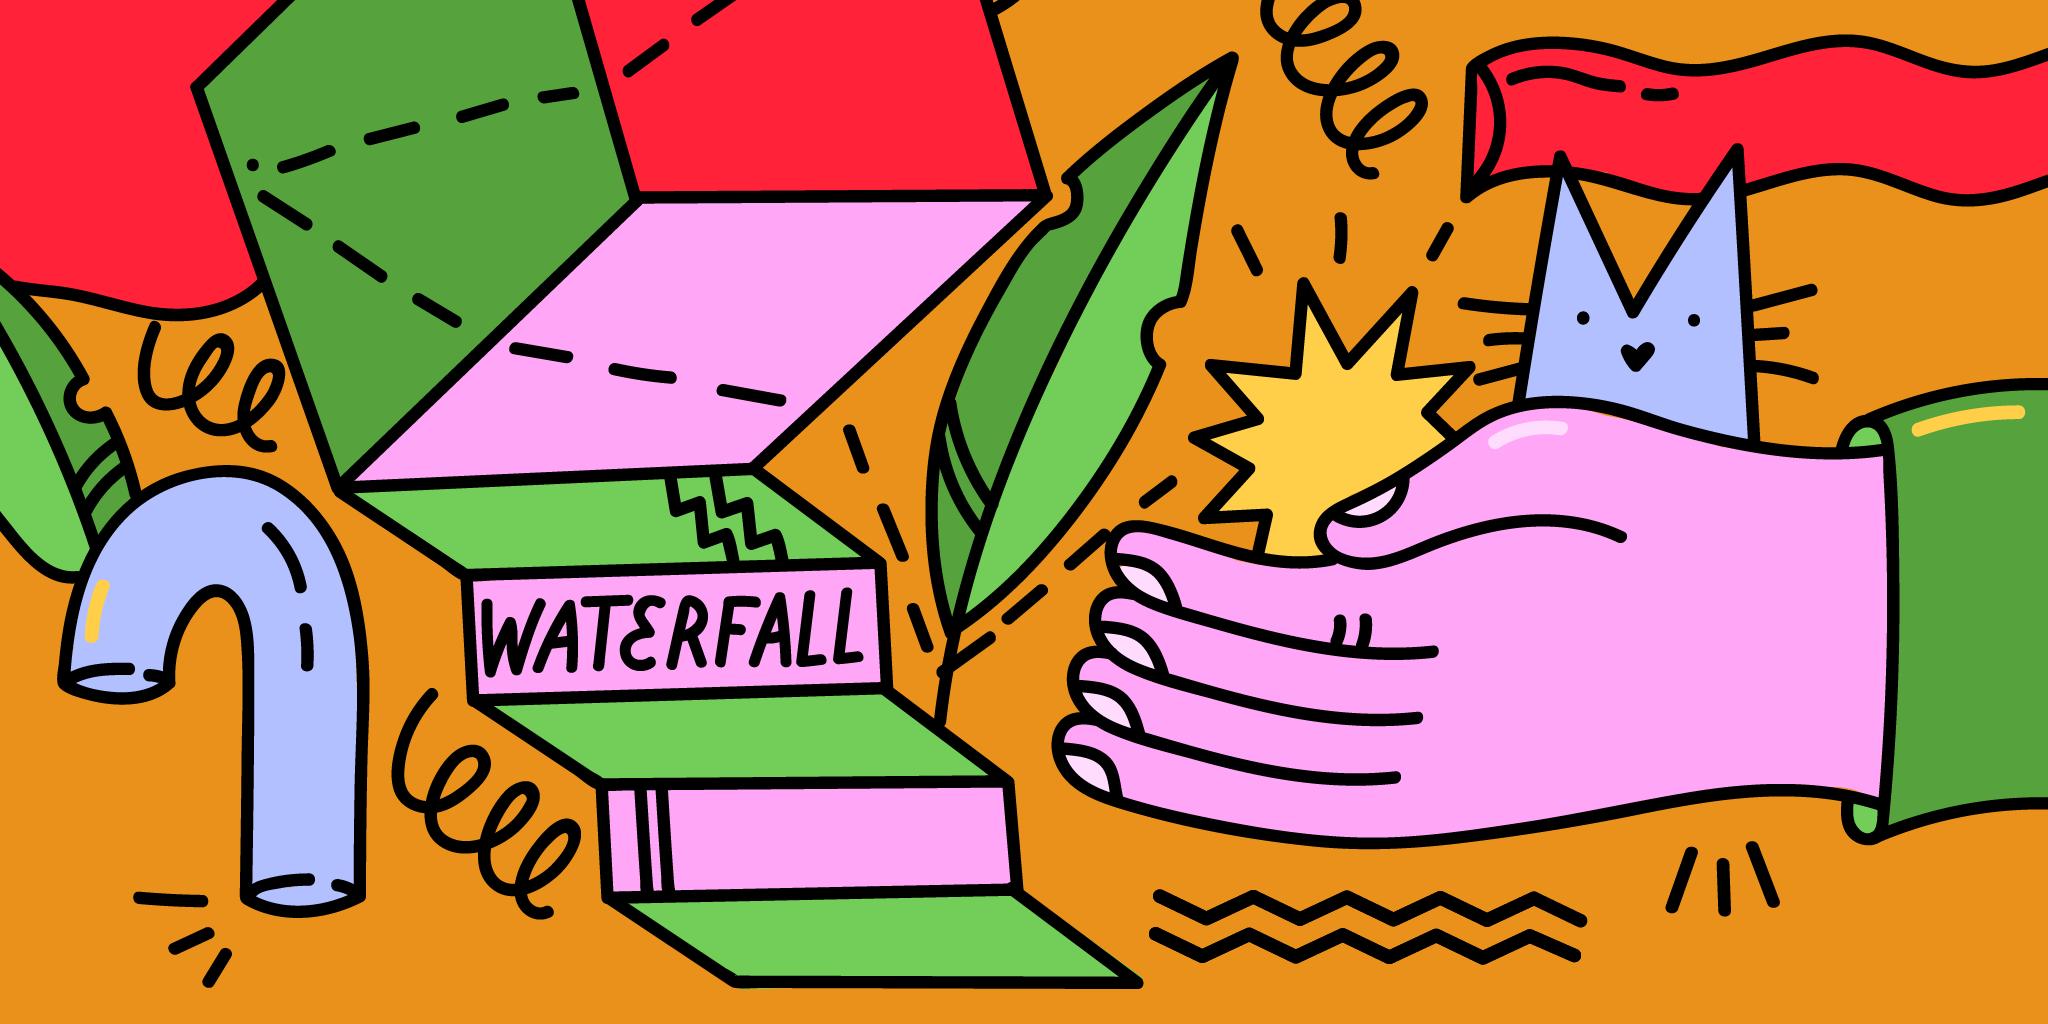 Методологии разработки: Waterfall